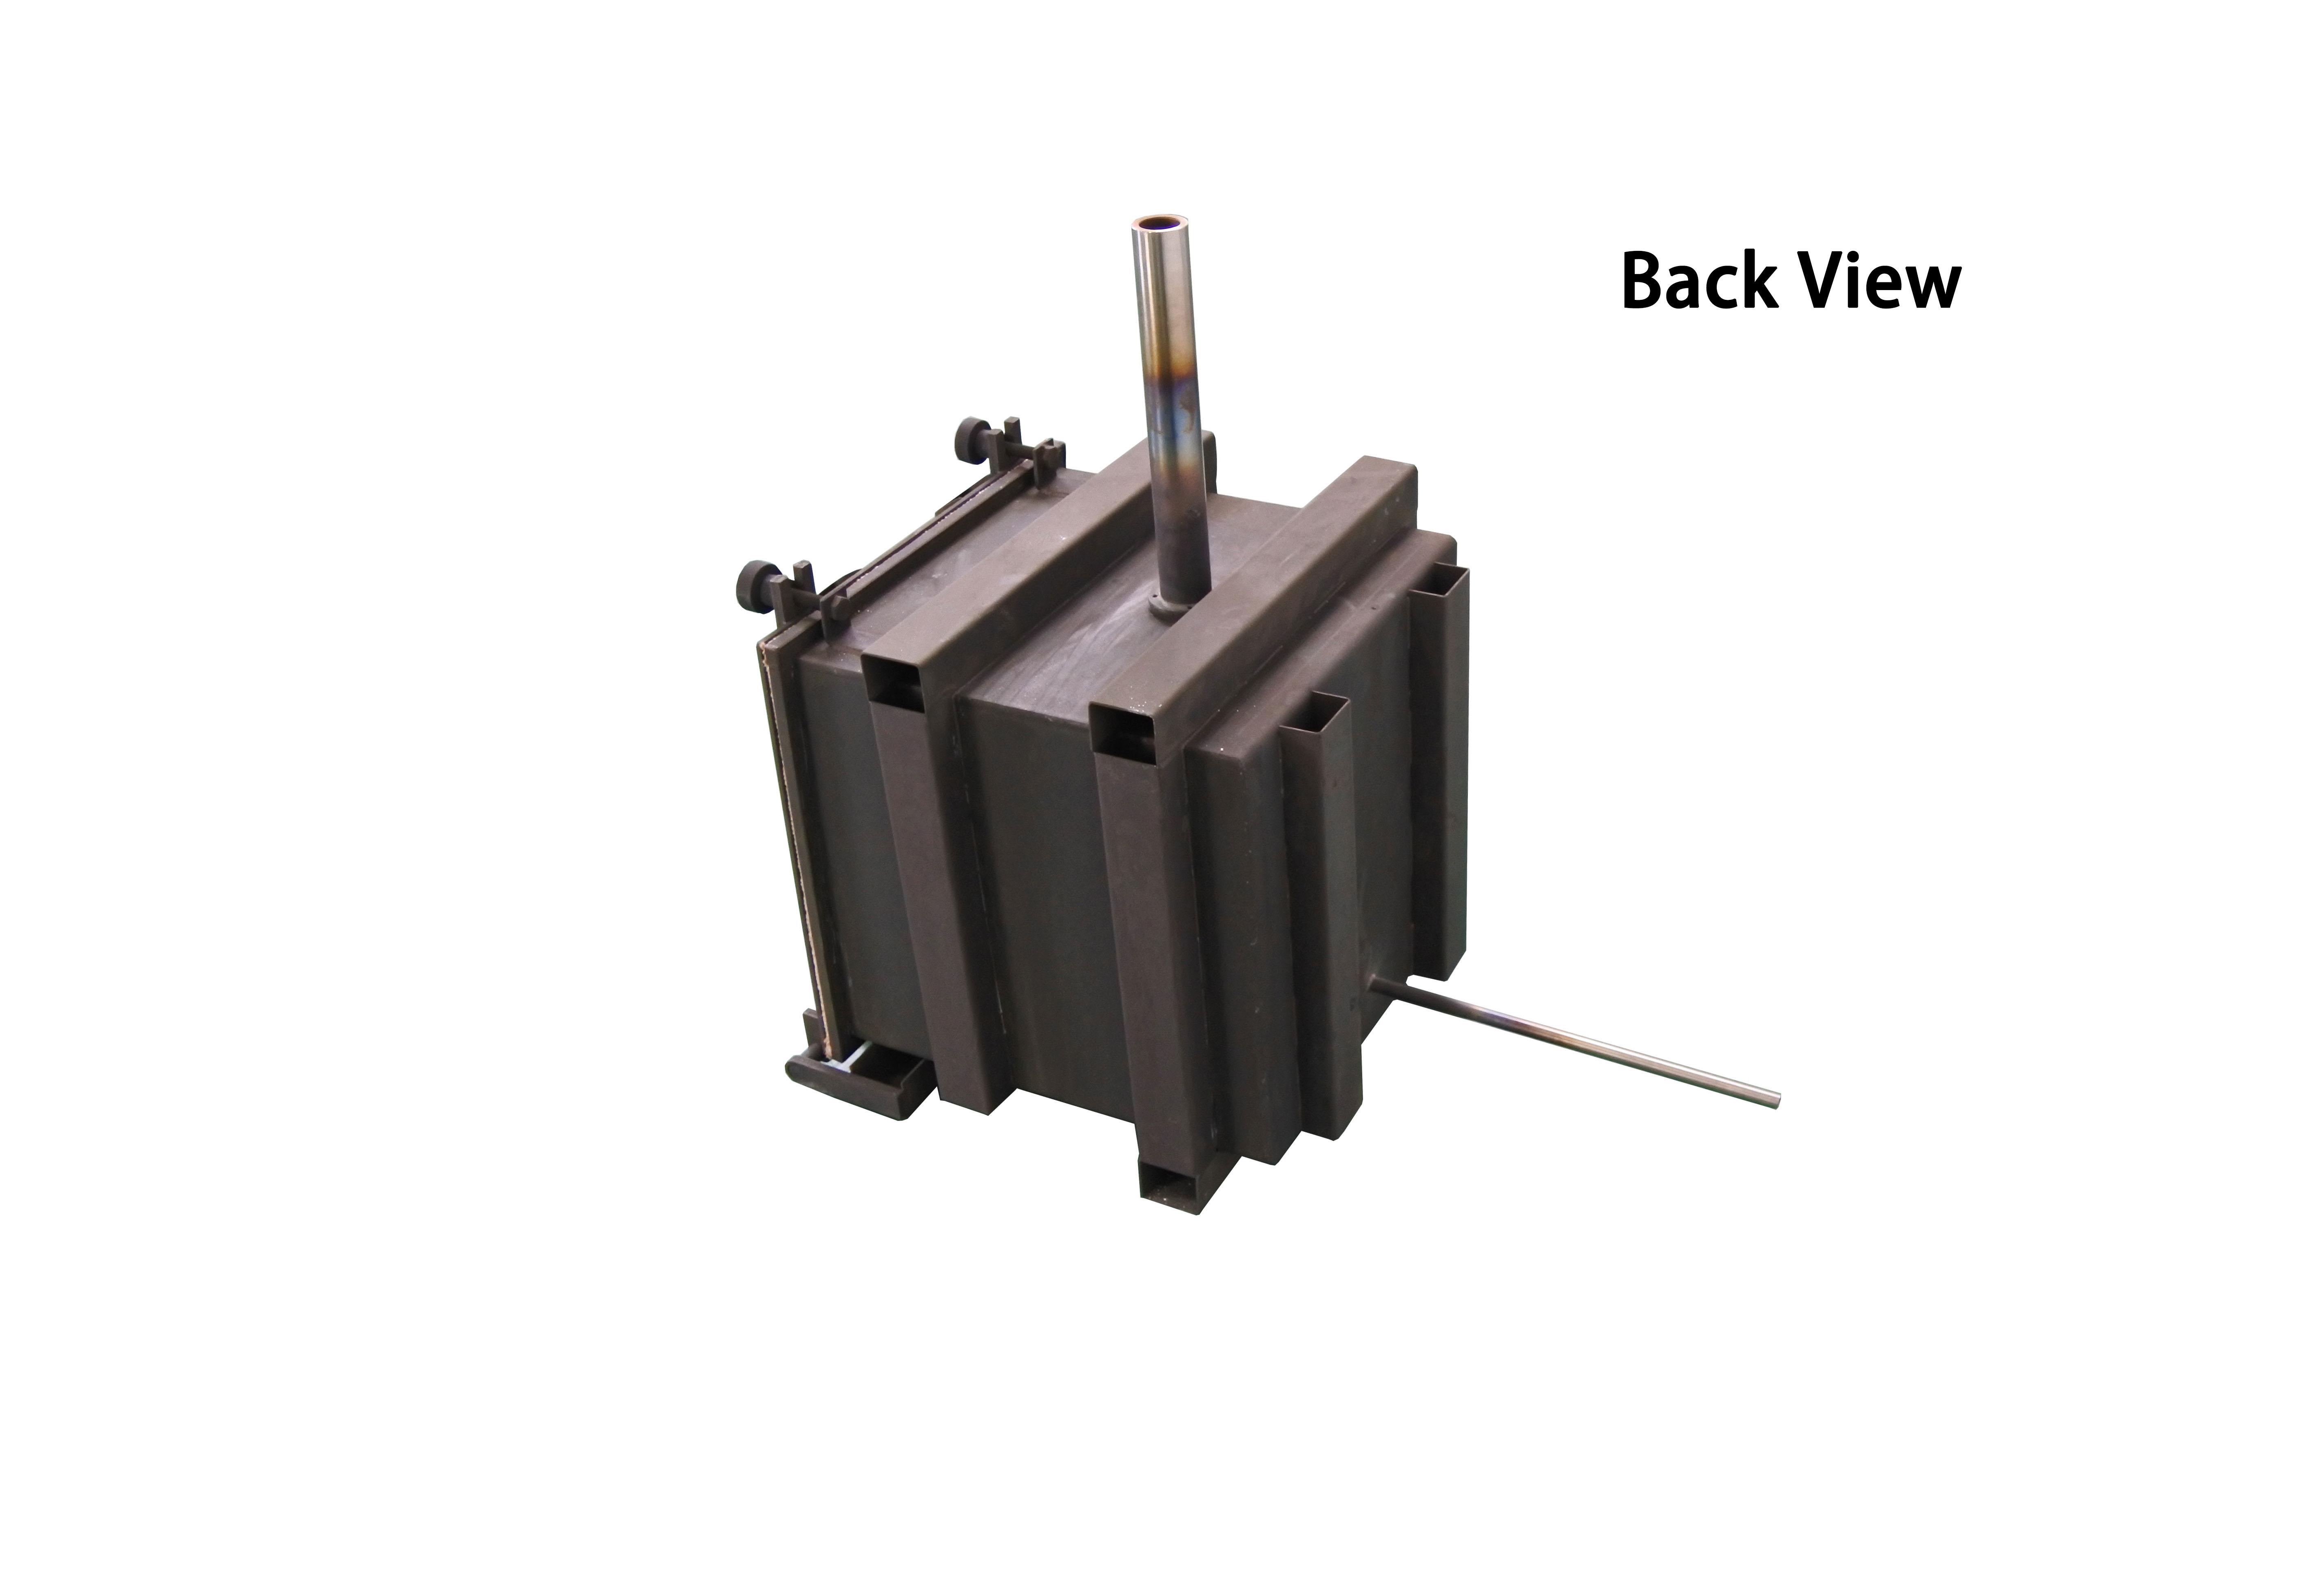 Micrometer Adjustable Film Applicator 150 Mm Film